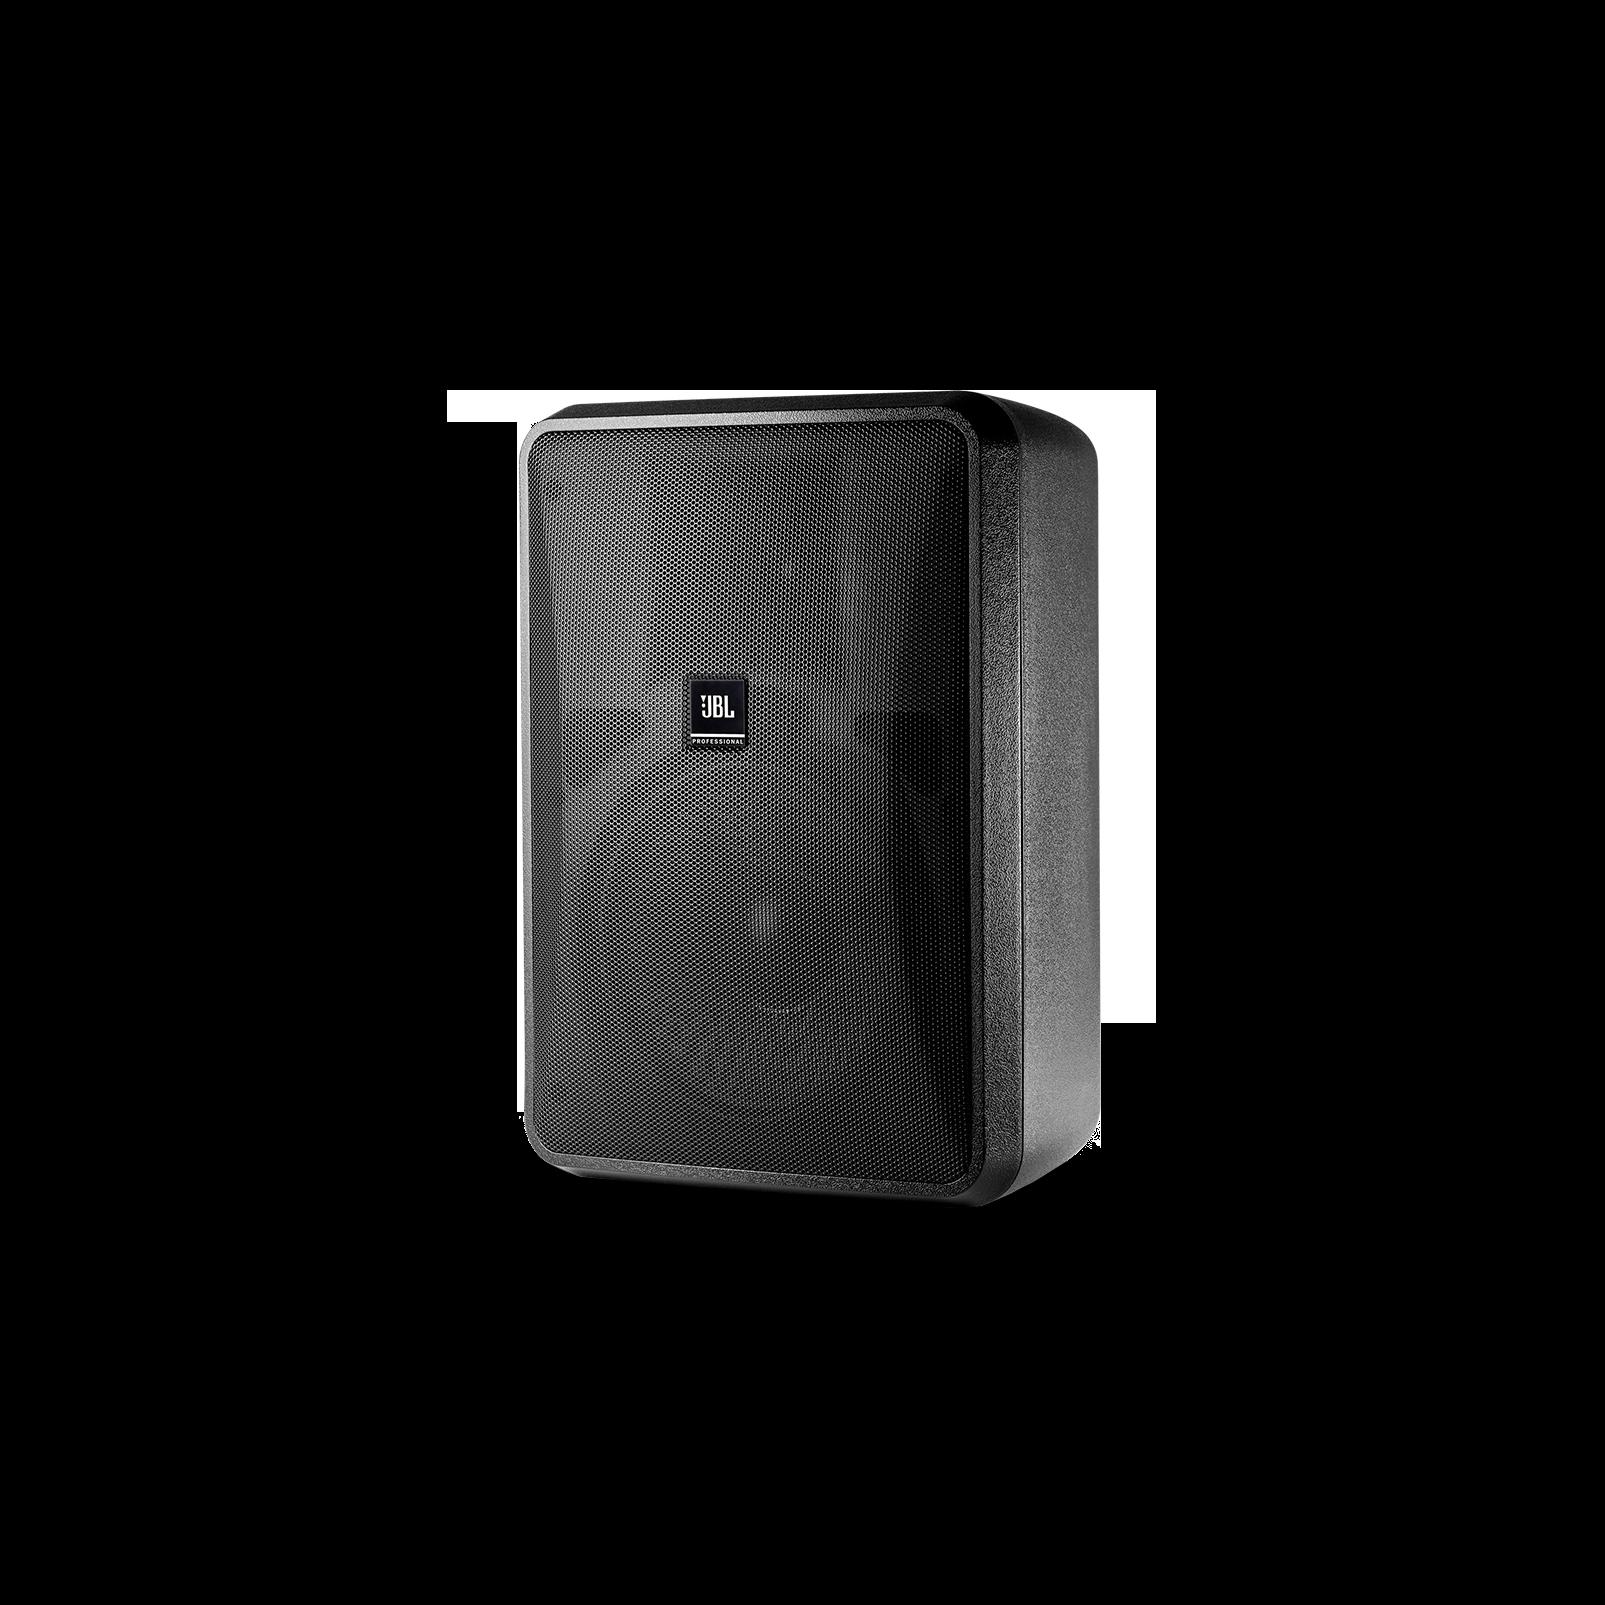 JBL Control 28-1 (Pair) - Black - High Output Indoor/Outdoor Background/Foreground Speaker - Hero